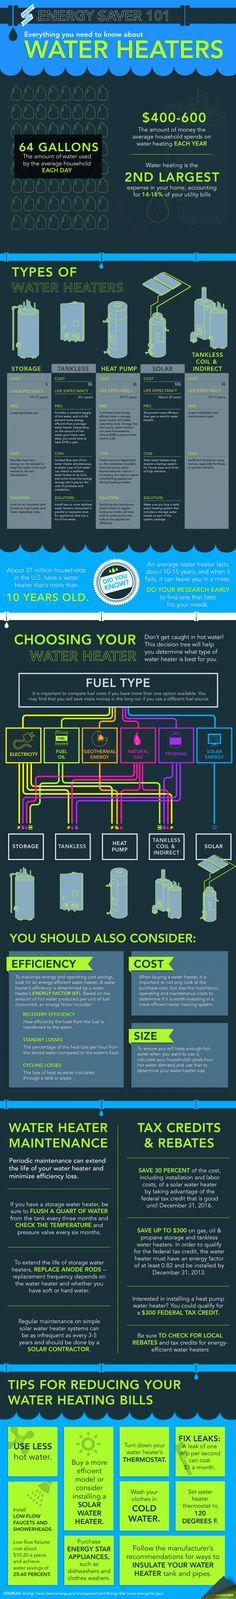 48 best Underfloor Heating images on Pinterest | Underfloor heating ...